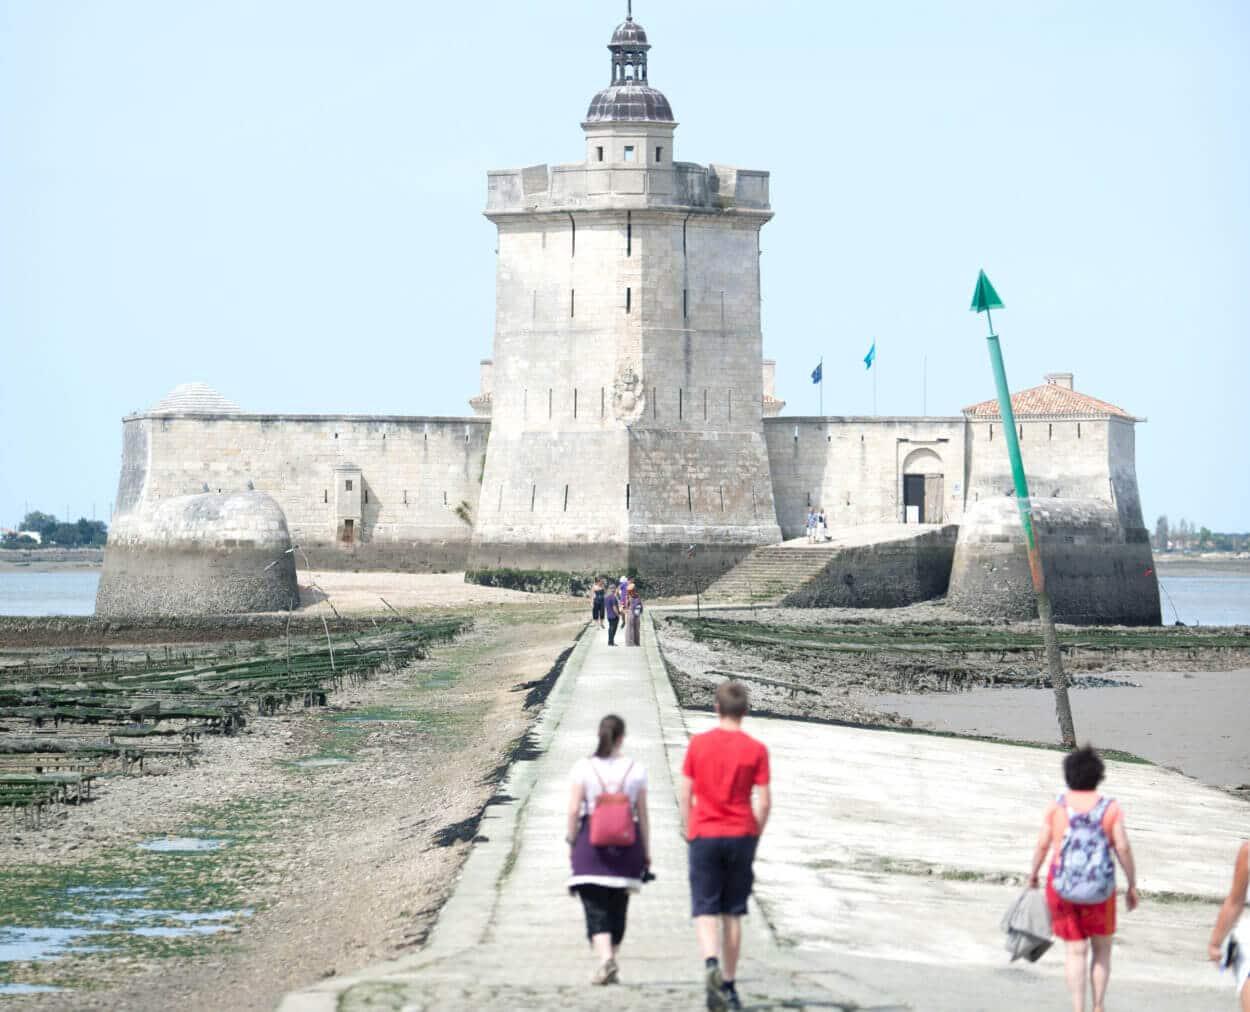 walking to Fort Louvois